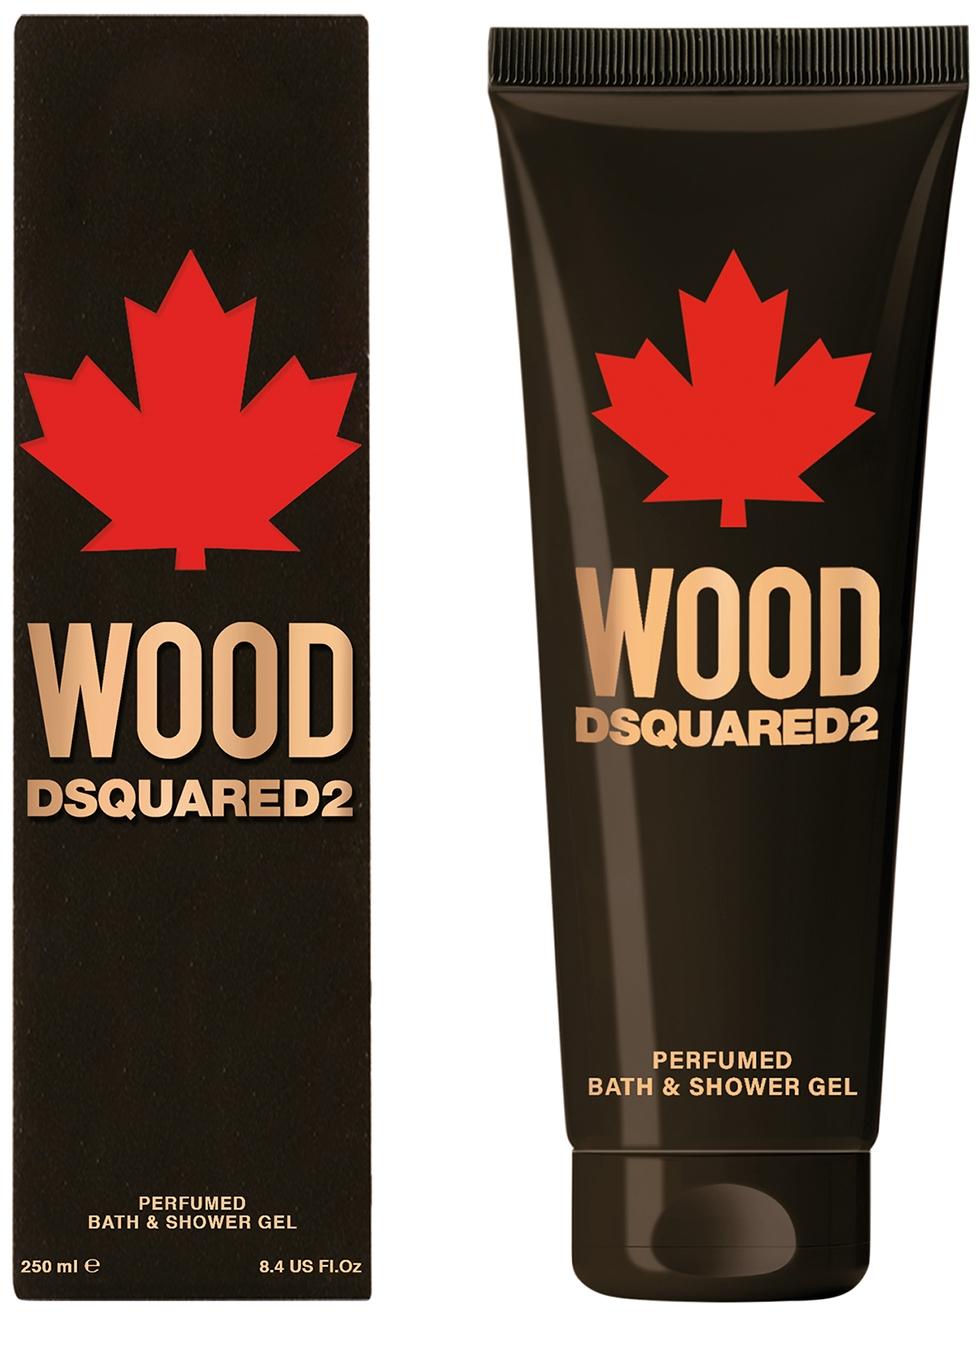 Wood Pour Homme Shower Gel 250ml - Dsquared2